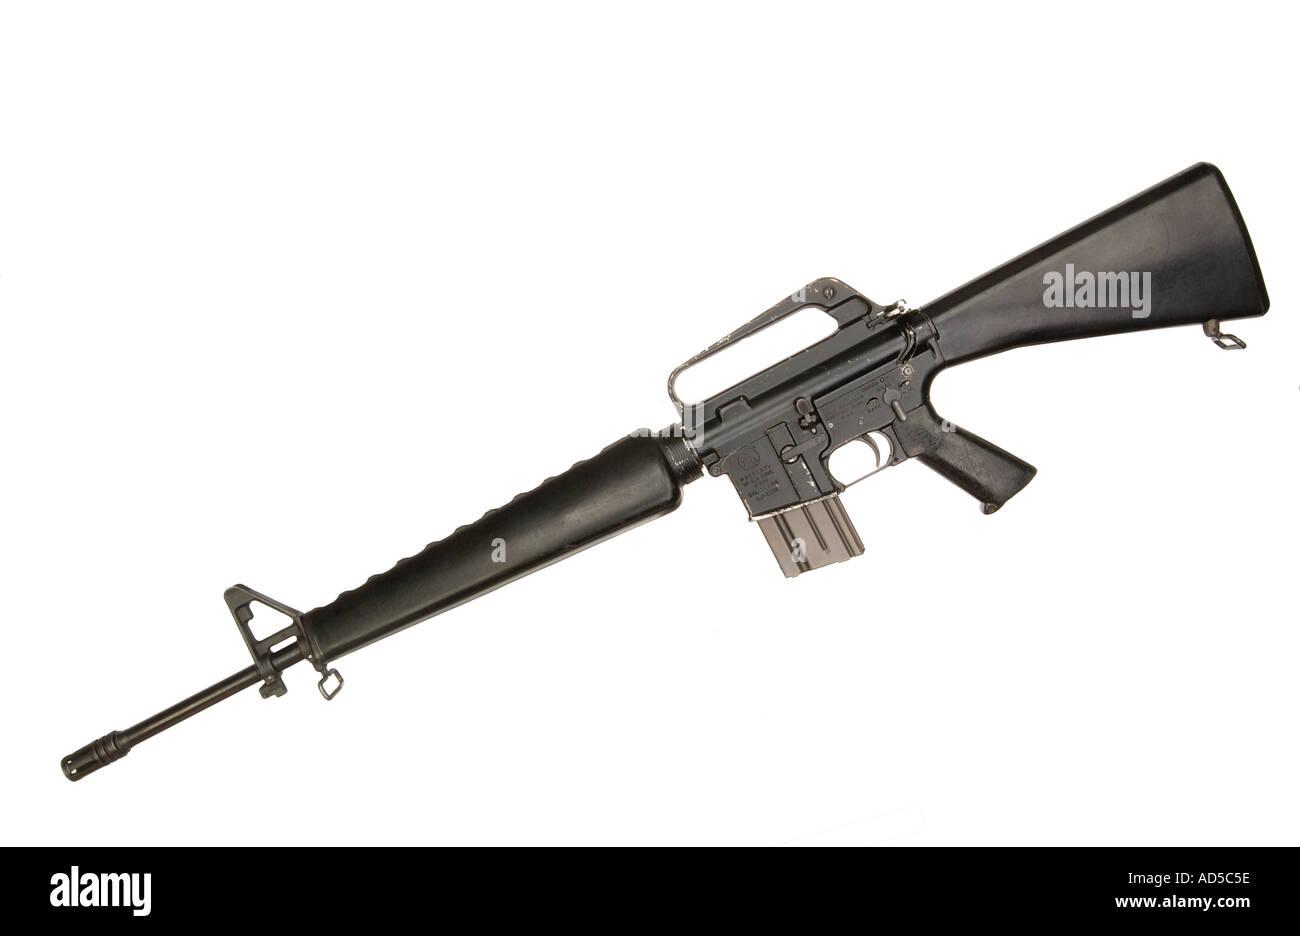 Colt M16 A rifle - Stock Image